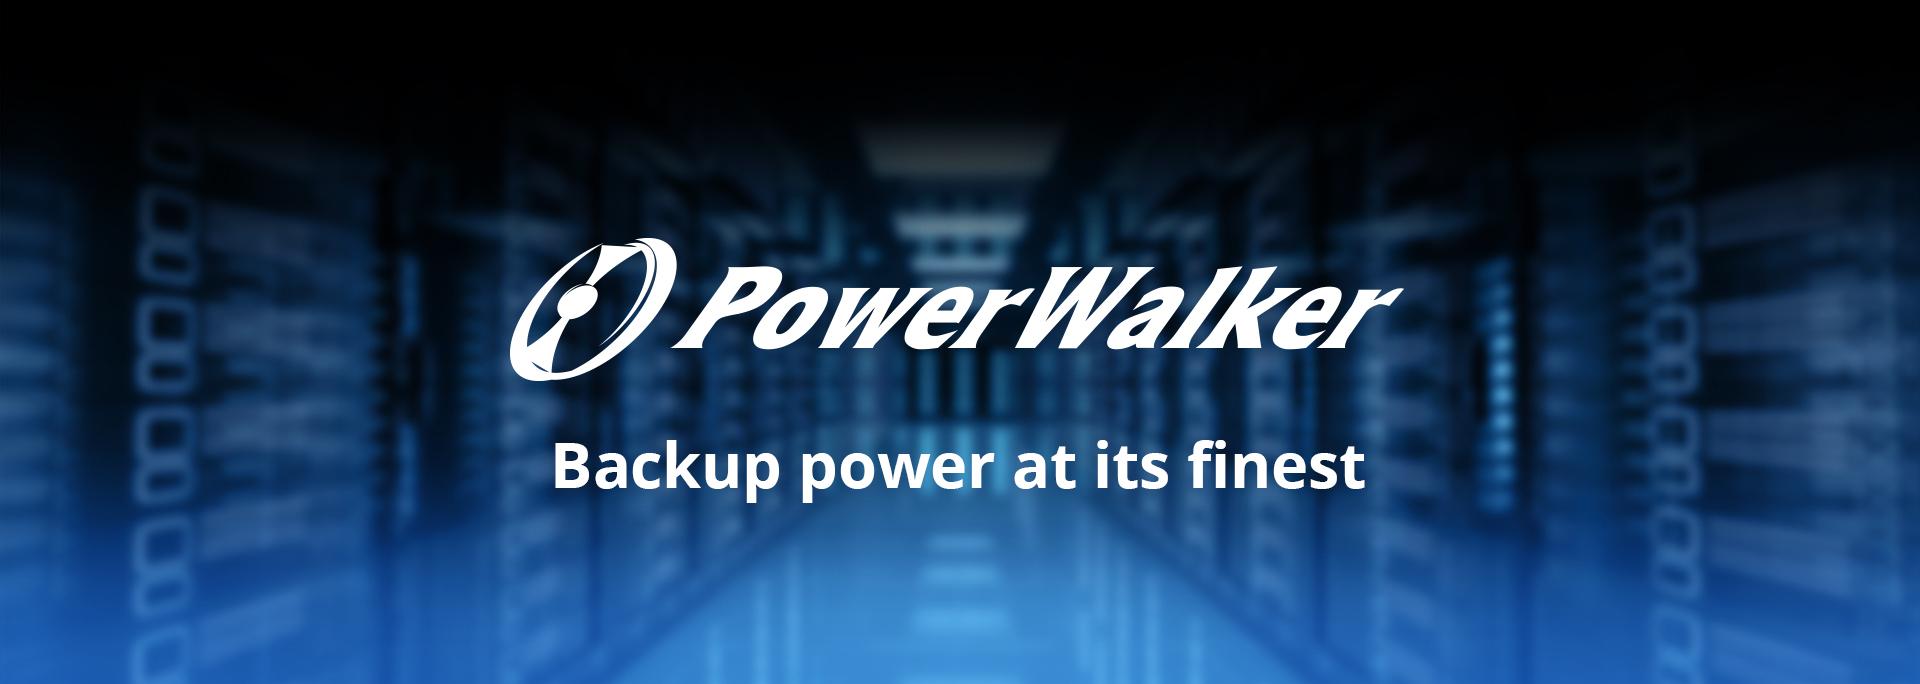 gaming ups line-interactive 1500va power walker, 4x 230v pl, usb, lcd, 2x charger usb, rgb lghting 9